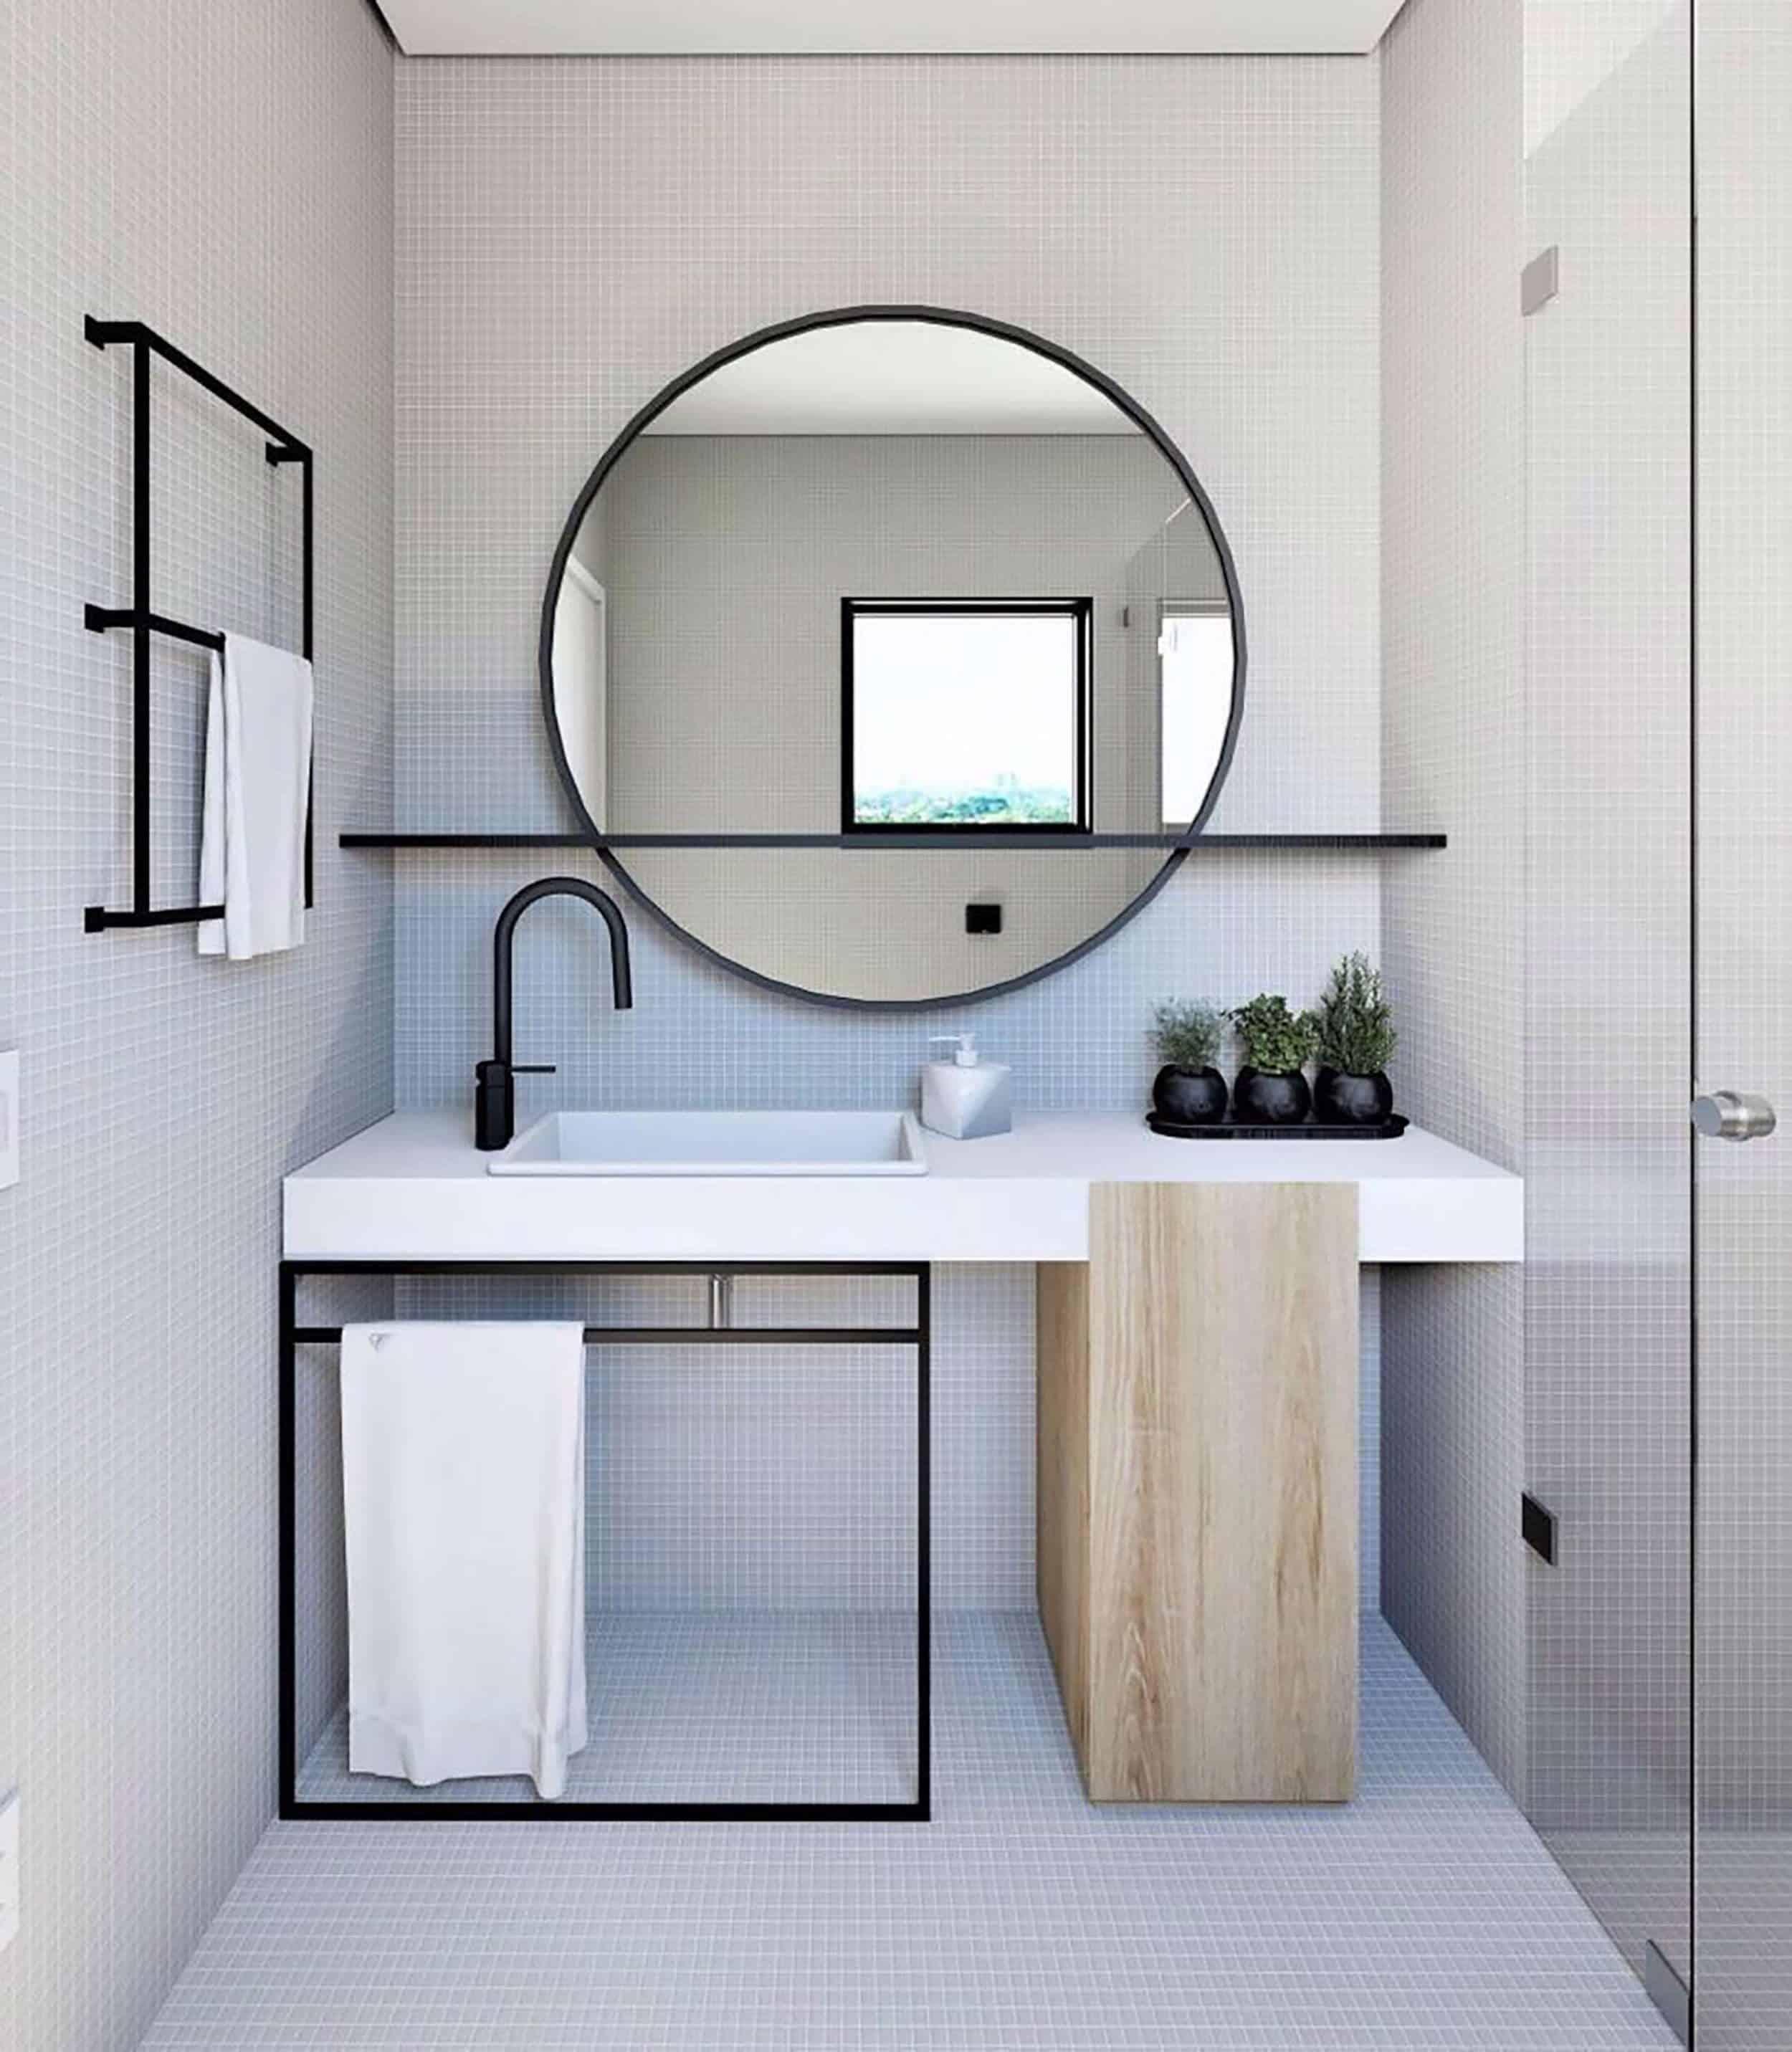 17 Fresh Inspiring Bathroom Mirror Ideas To Shake Up Your Morning Lipstick Routine